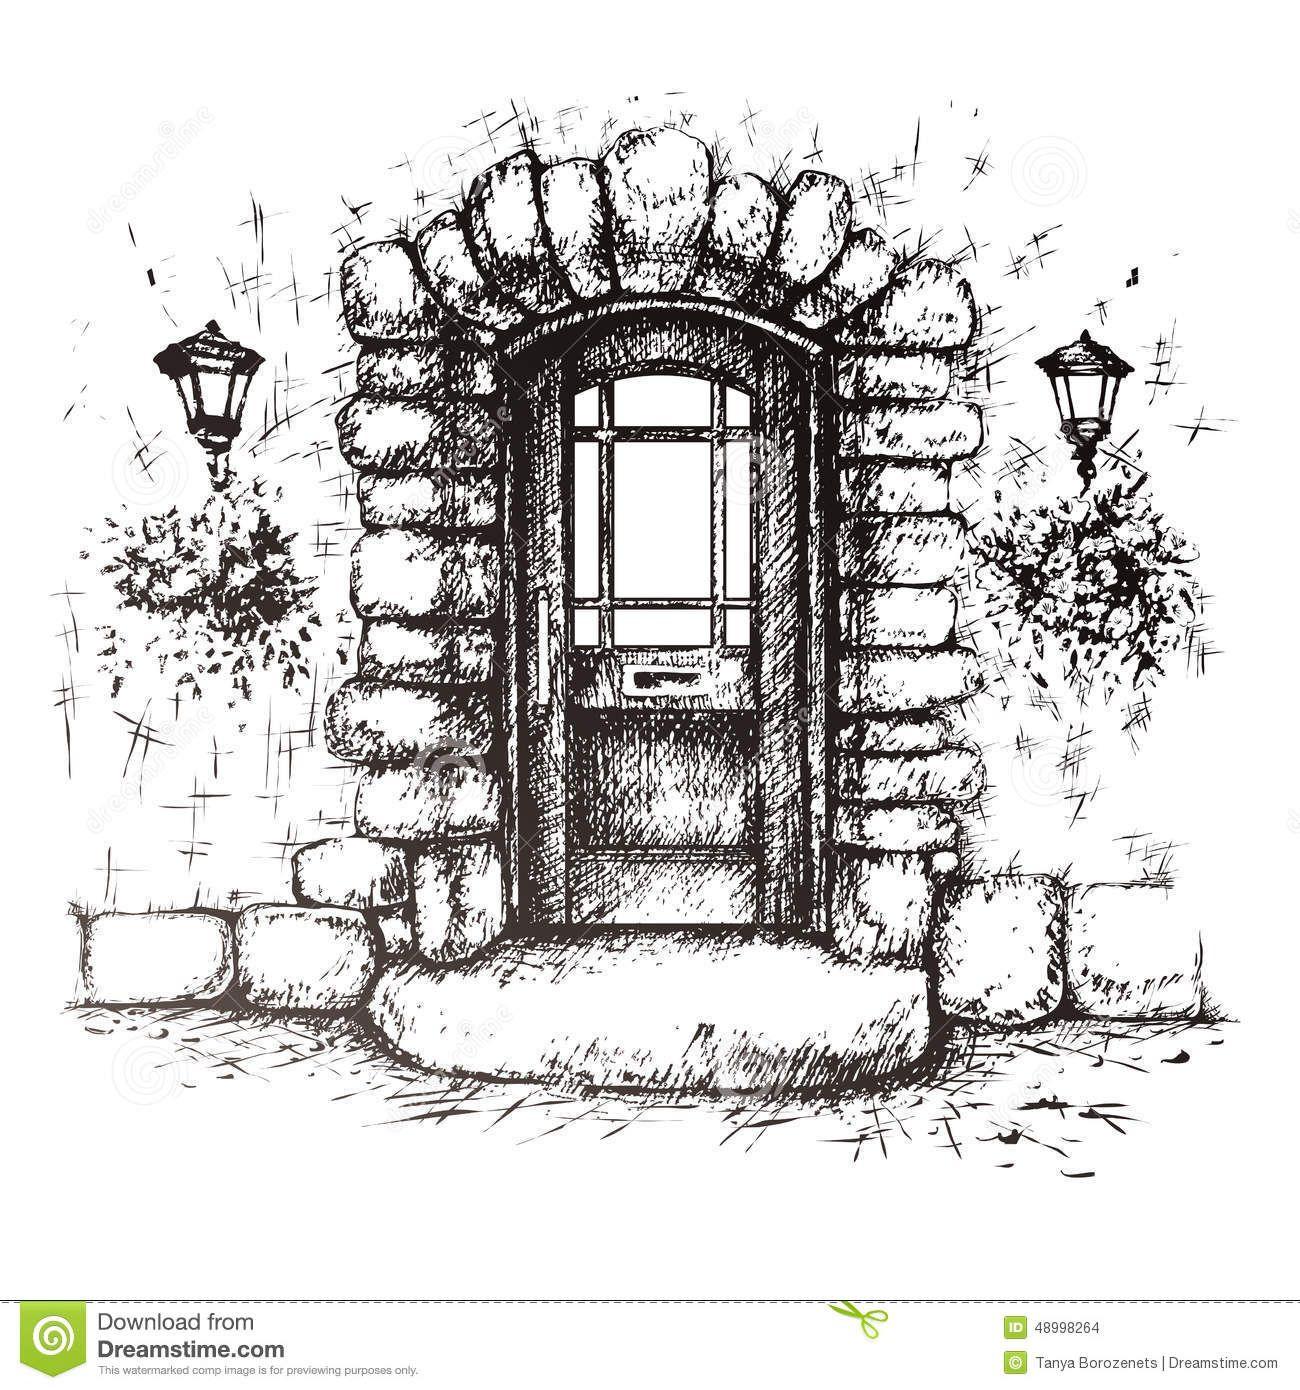 jpg transparent download Vector door sketch. Freehand drawing of old